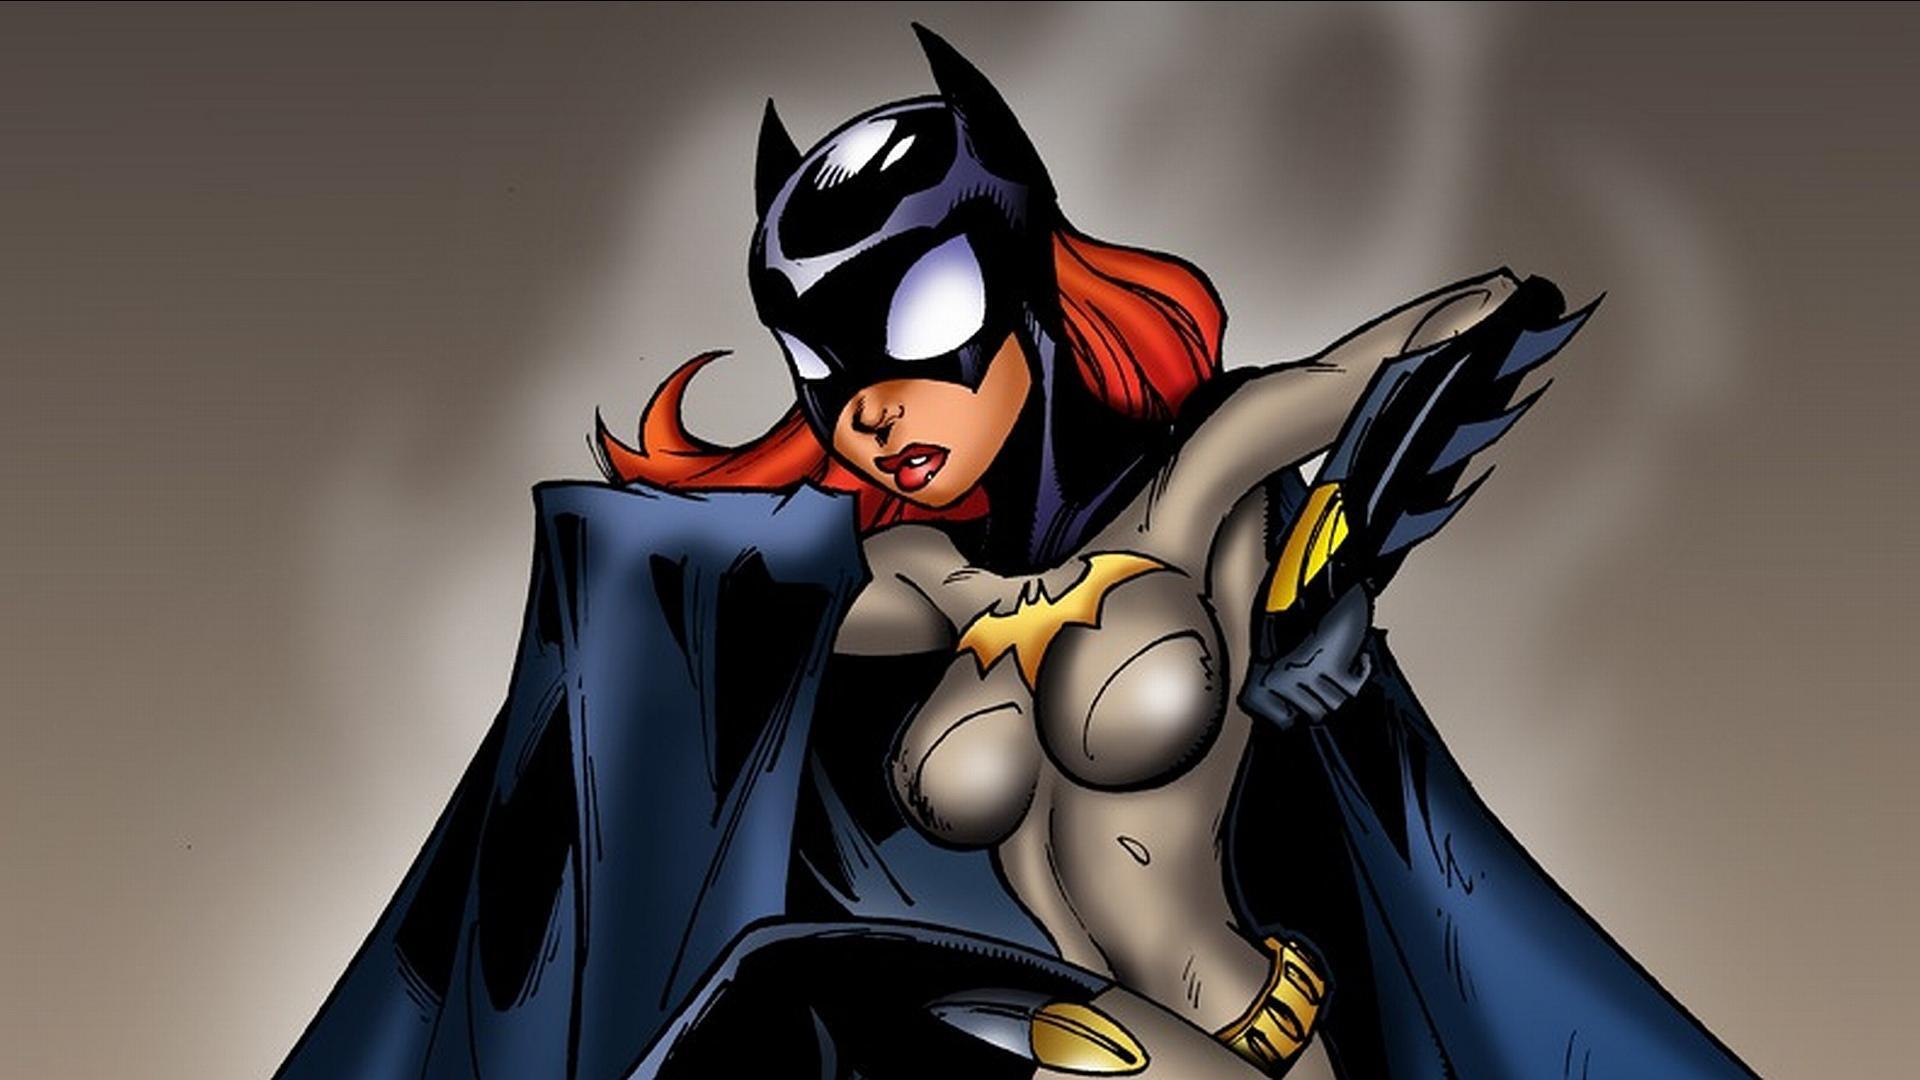 Xxx nude batgirl porn fucks picture